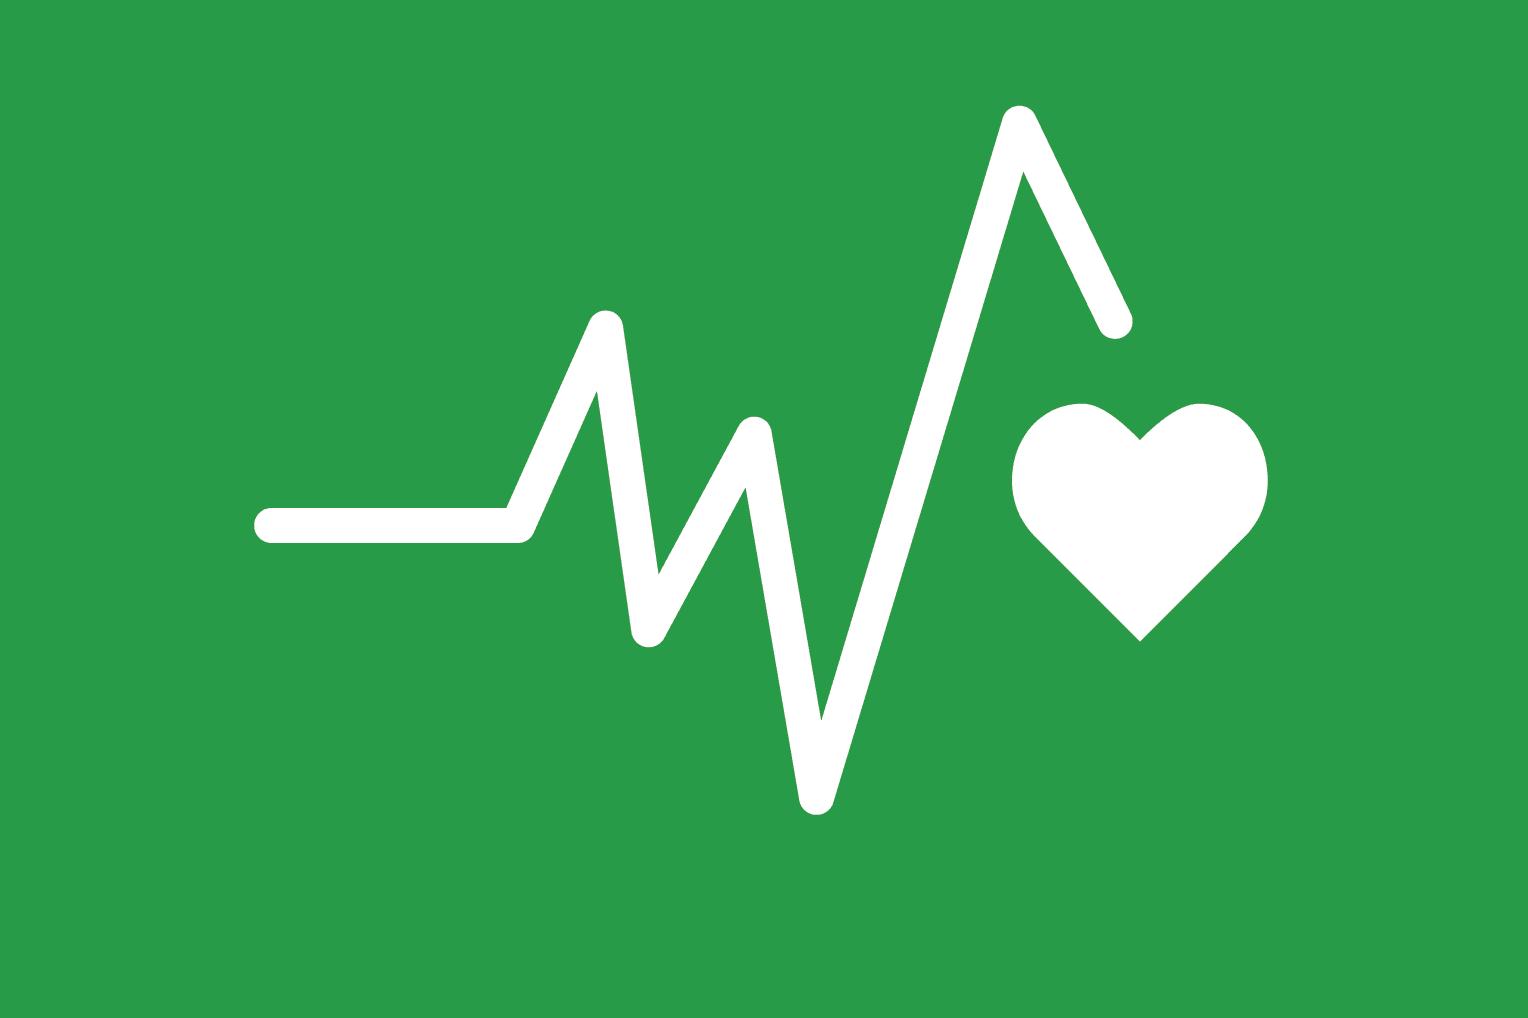 Sustainable Development Goal 3 – Good Health & Wellbeing